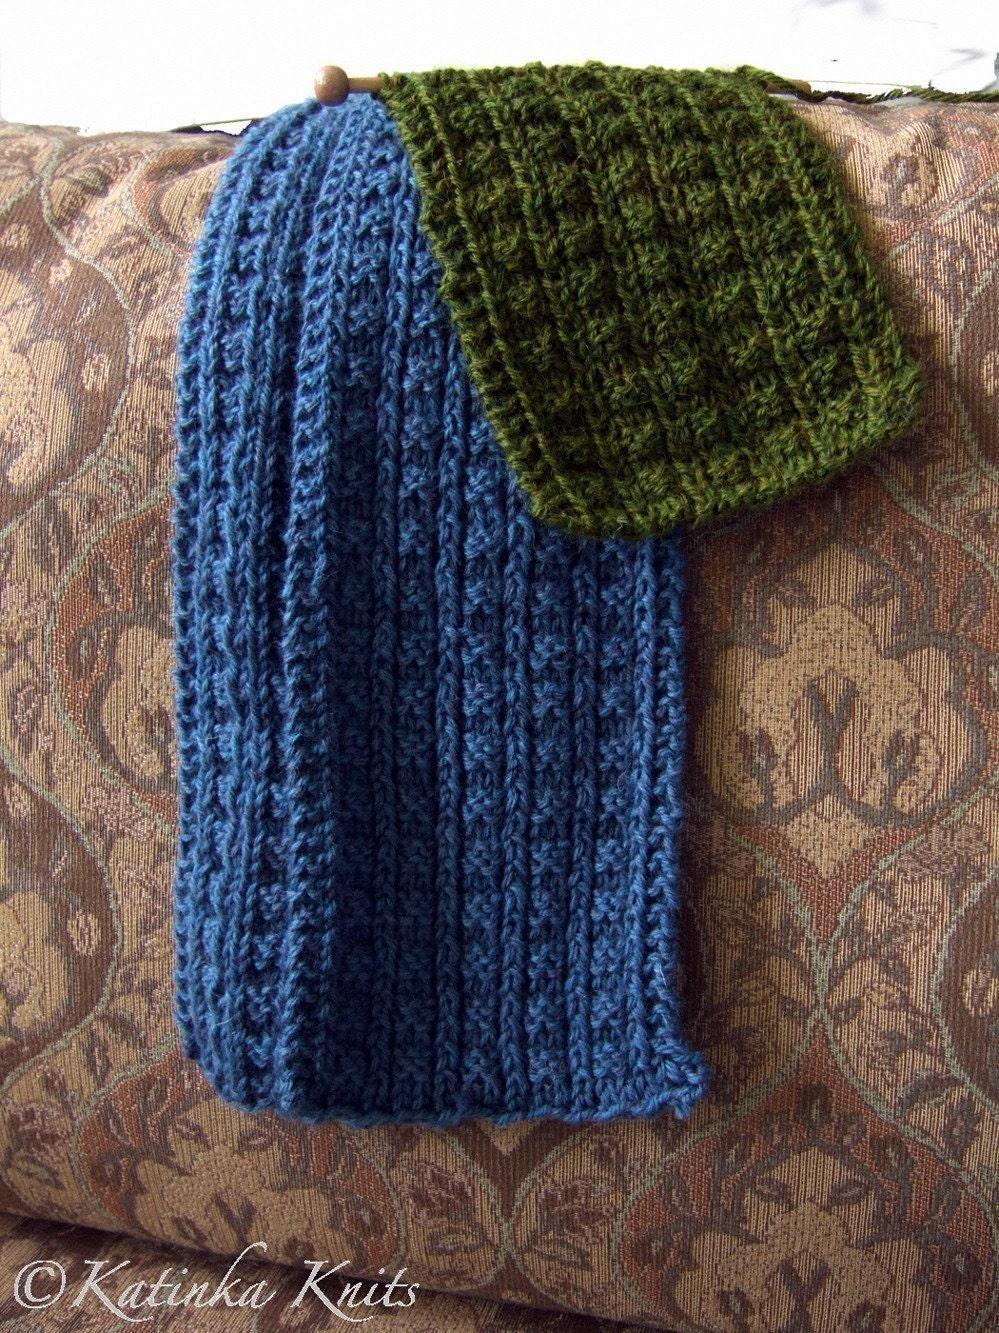 Easy Scarf Knitting Pattern : EASY SCARF KNITTING PATTERNS   FREE KNITTING PATTERNS